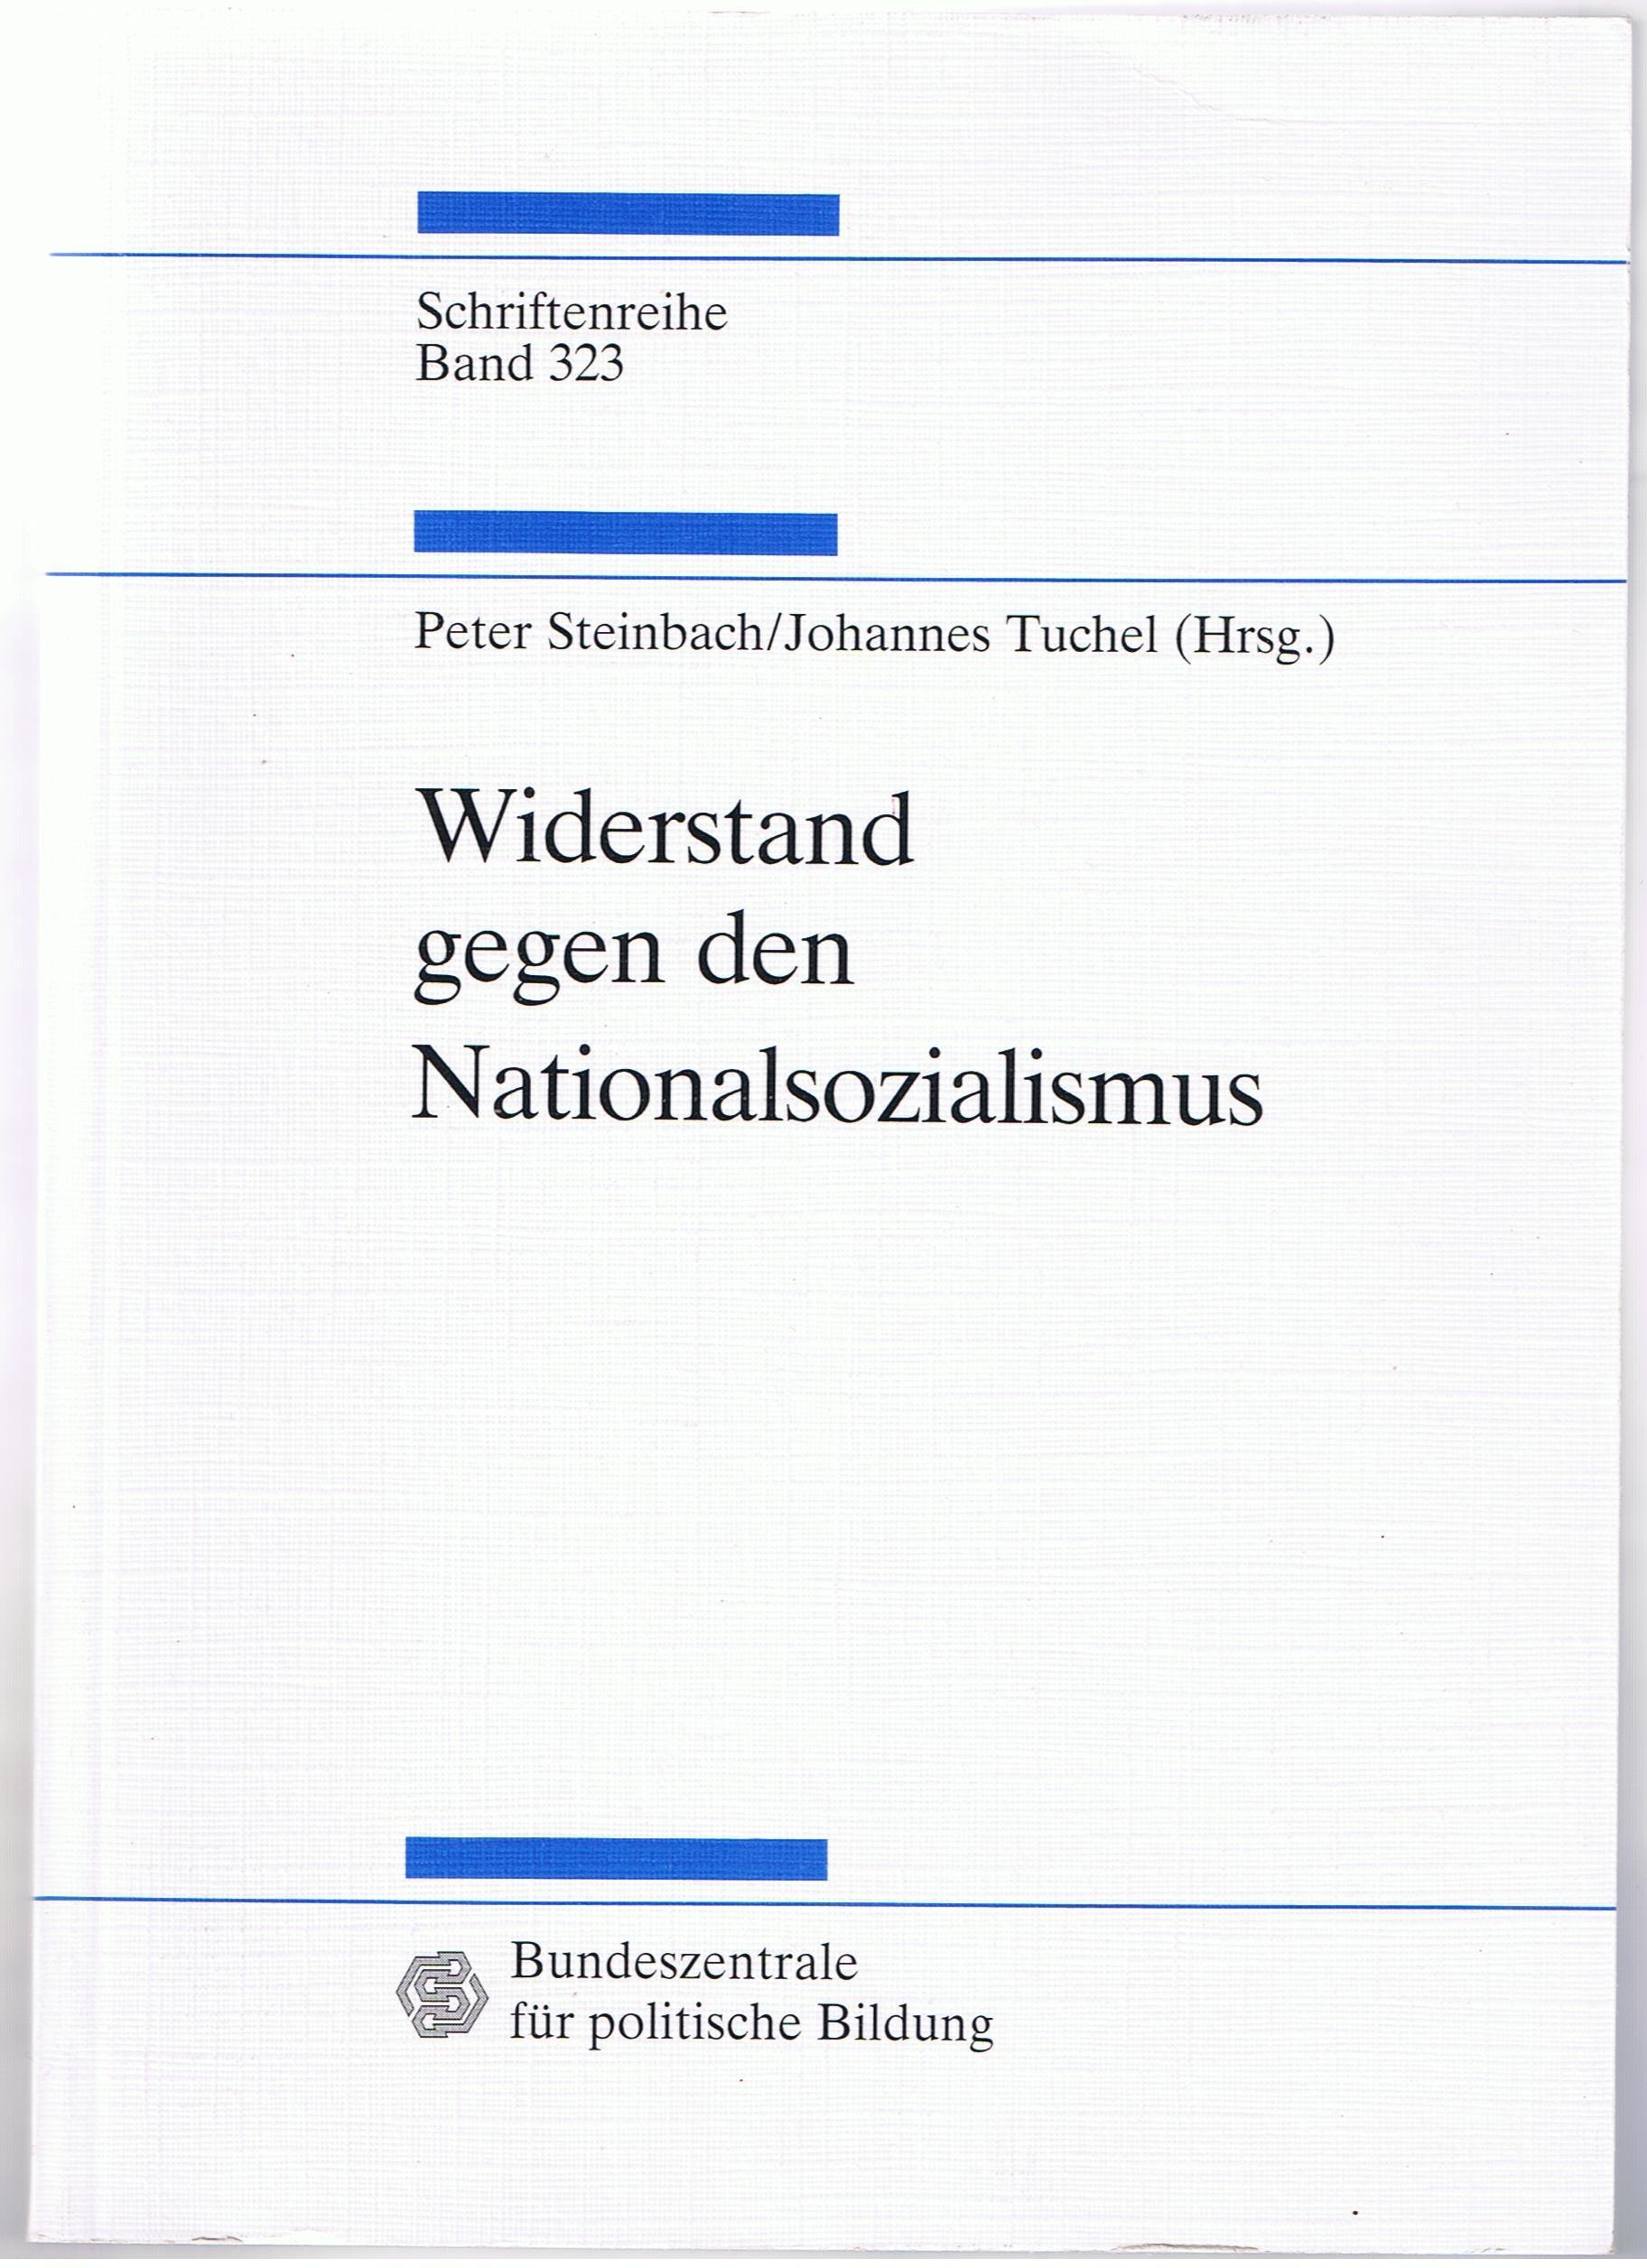 Widerstand gegen den Nationalsozialismus.